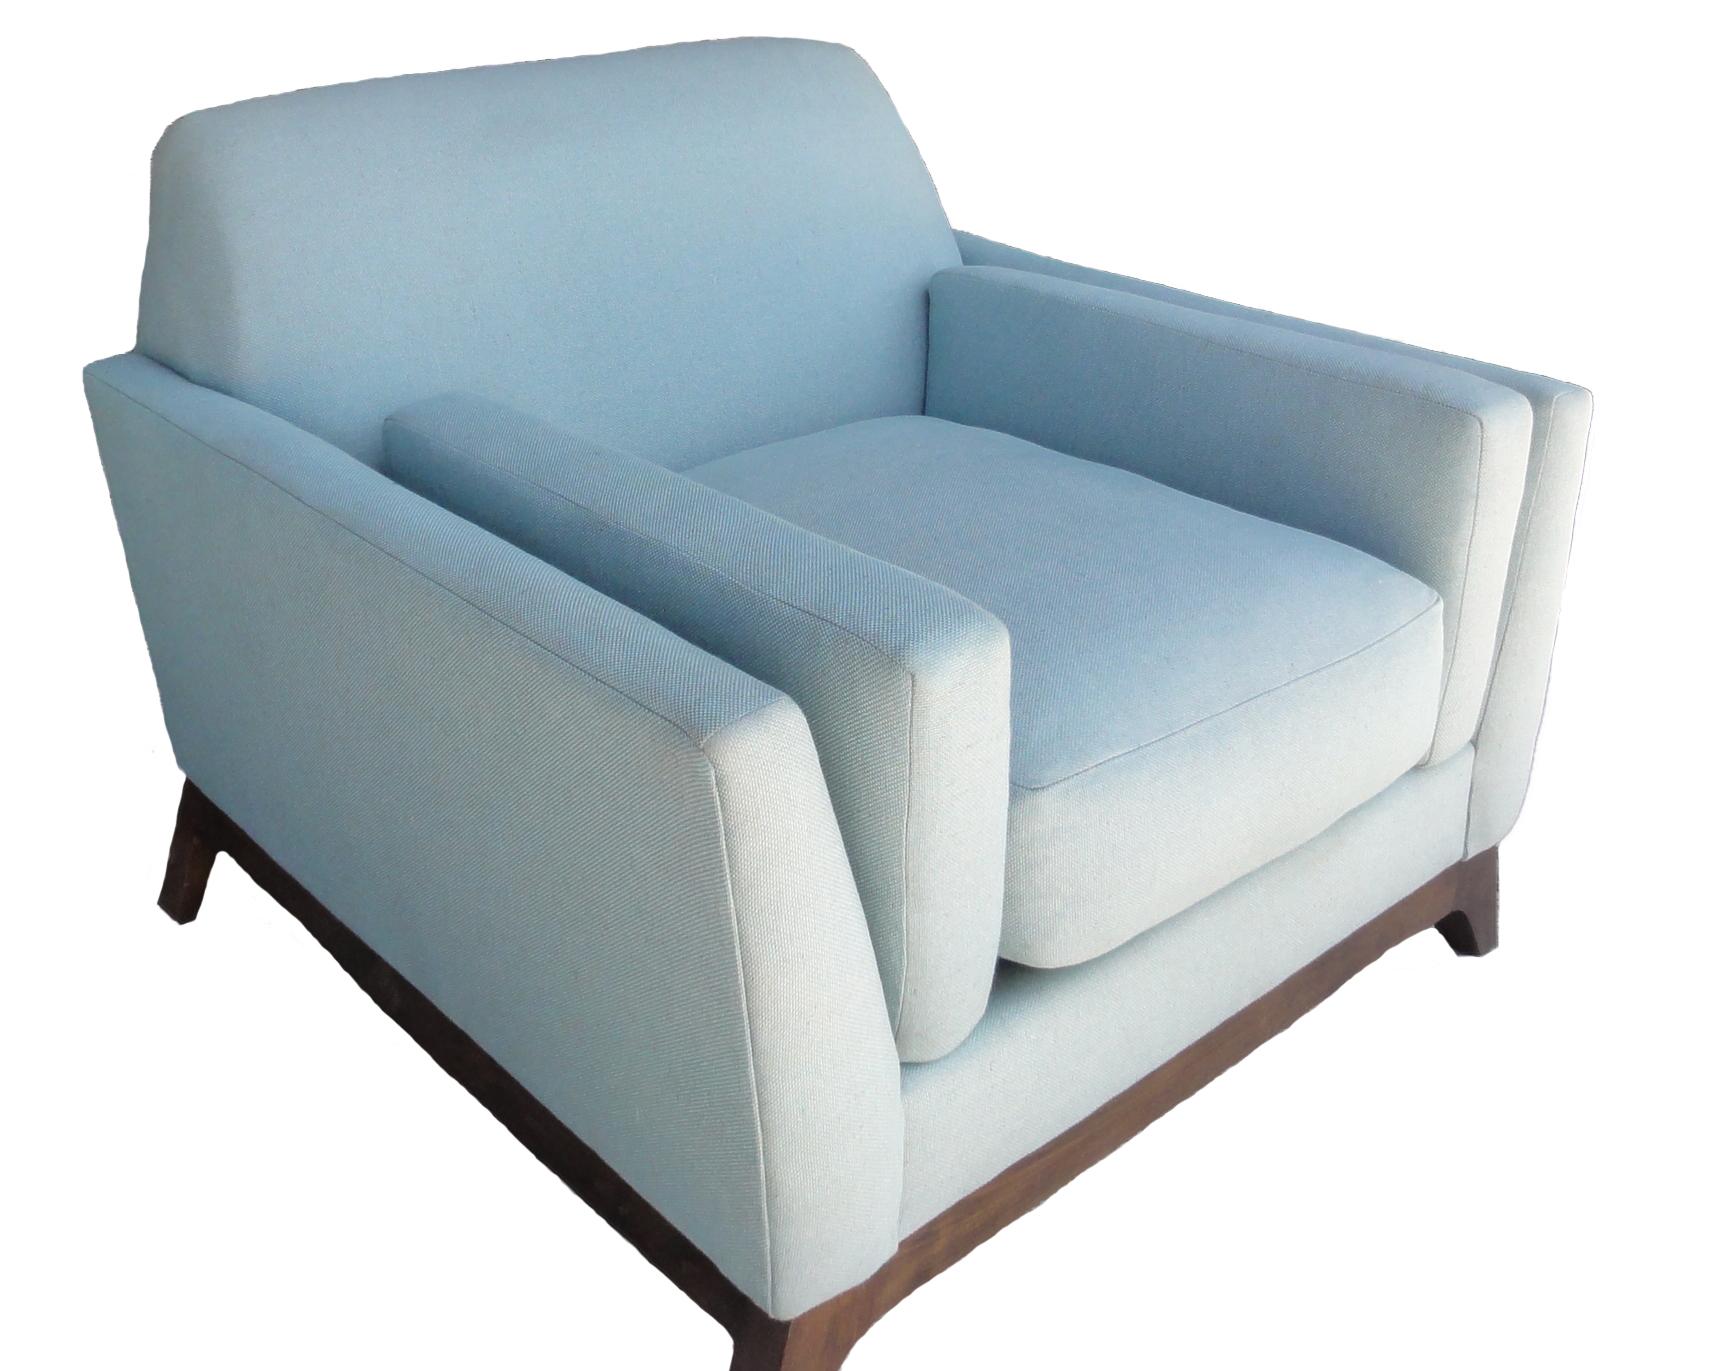 Century-chair-santa-barbara-design-center-4